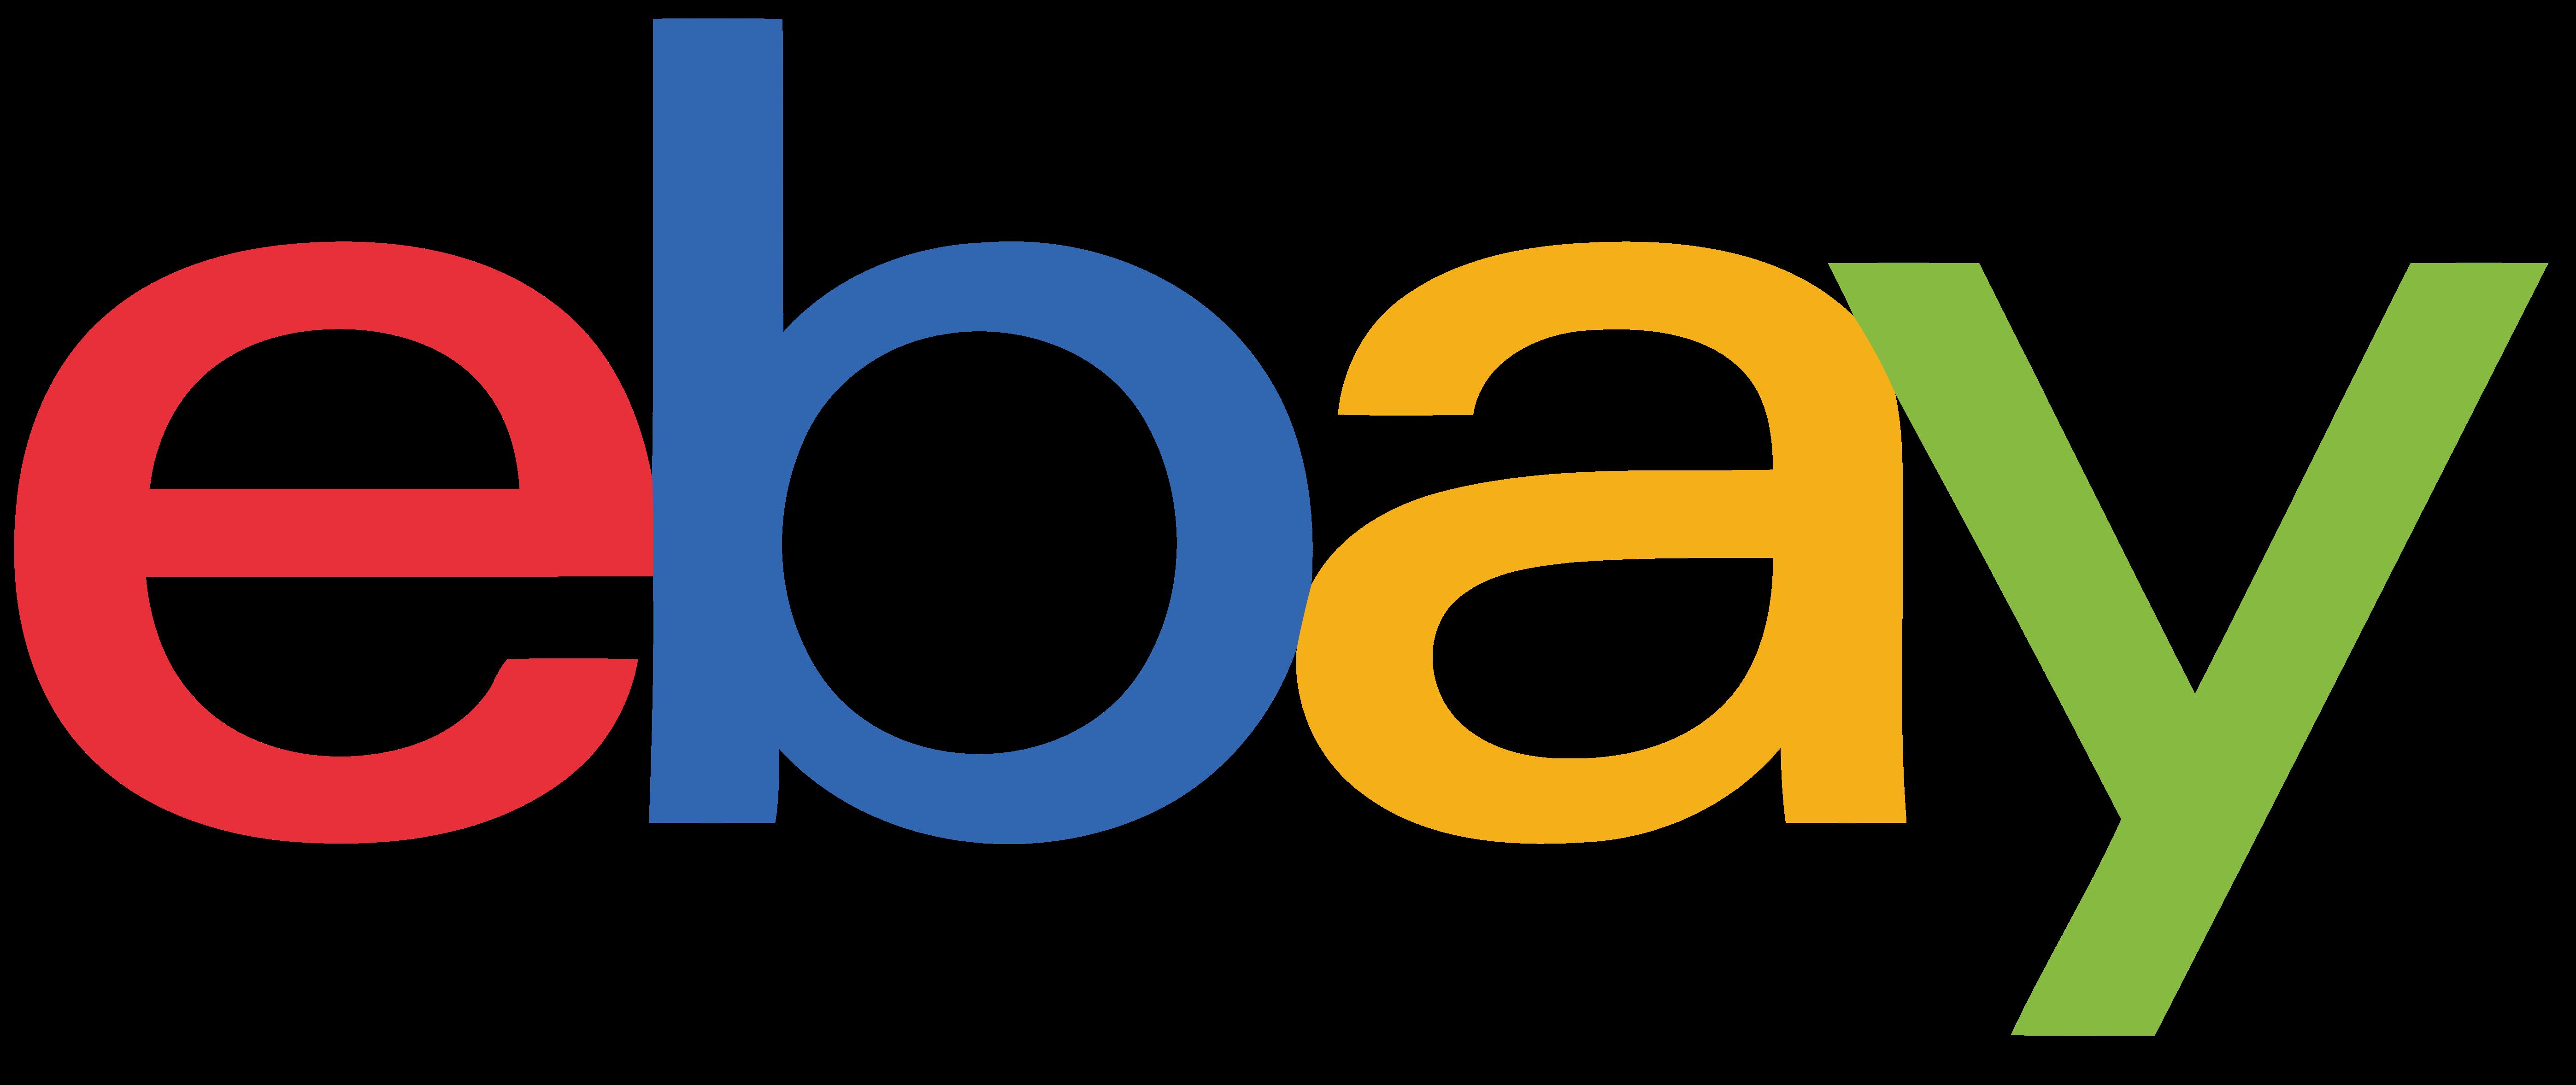 http://www.dedinidevil.de/eBay_logo_symbol